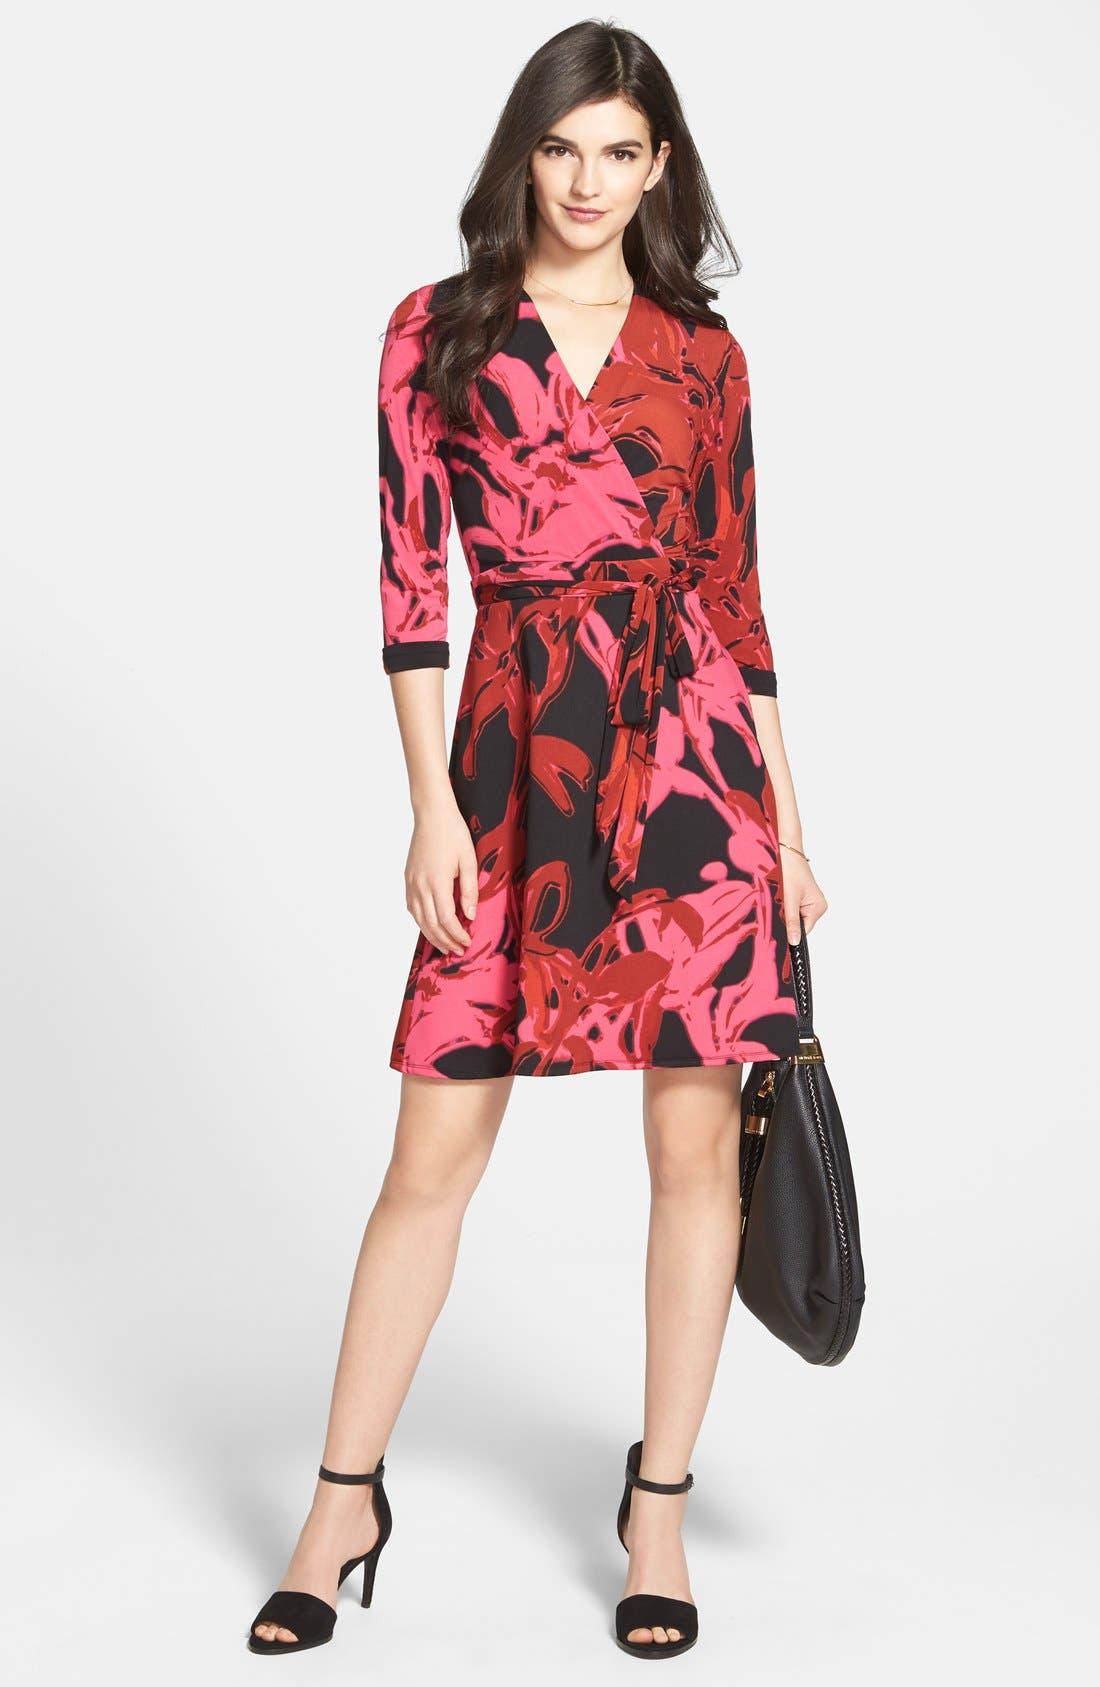 Alternate Image 1 Selected - Taylor Dresses Print Jersey & Scuba Faux Wrap Dress (Regular & Petite)